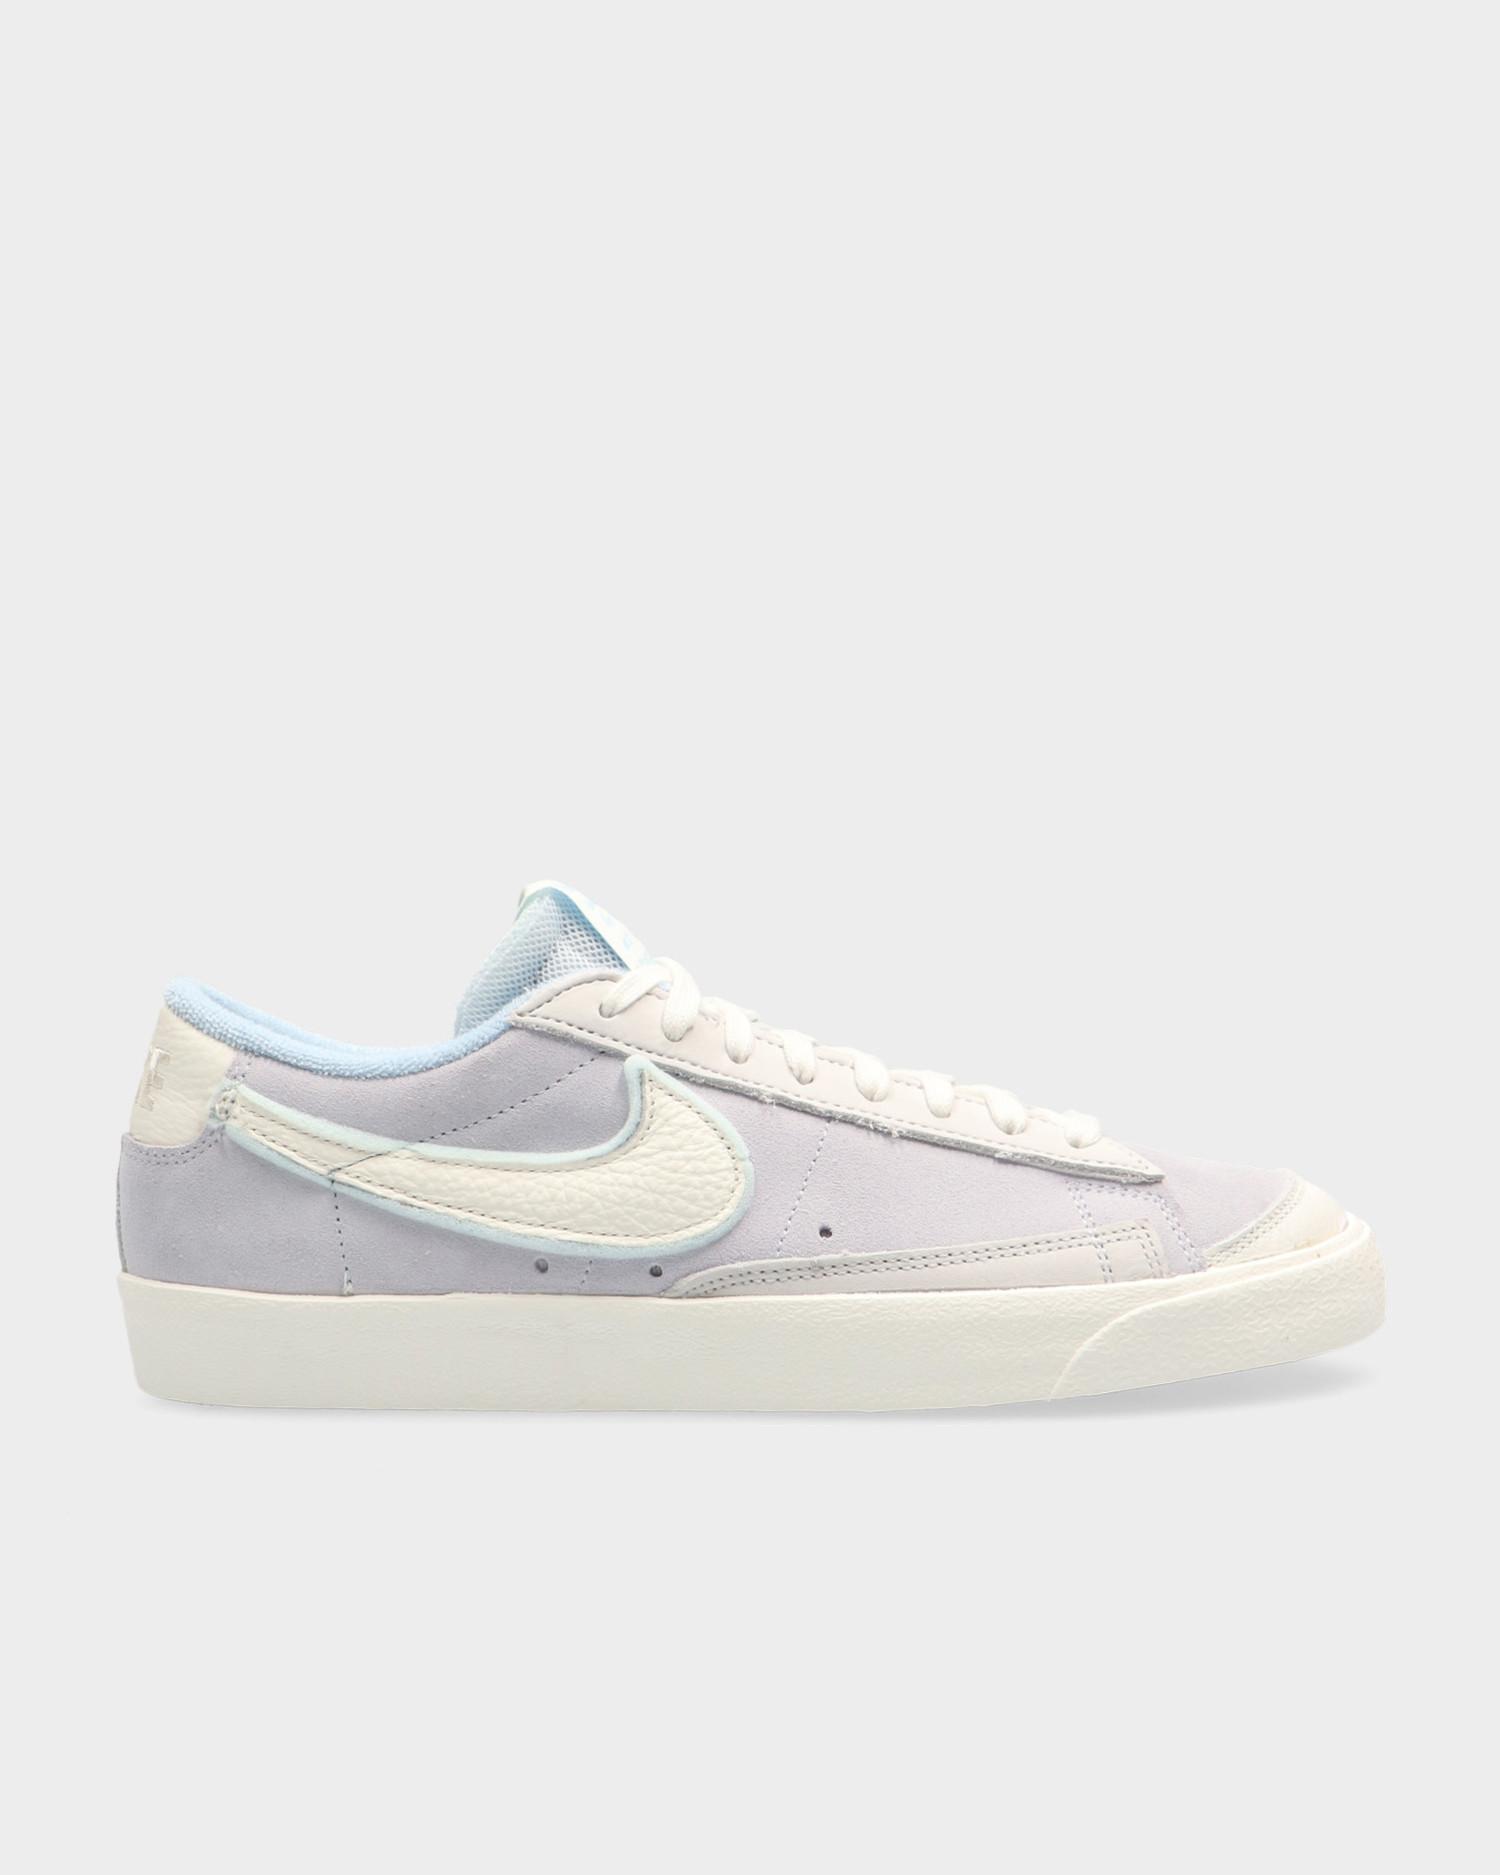 Nike Blazer Low vntg '77 Football Grey / Sail